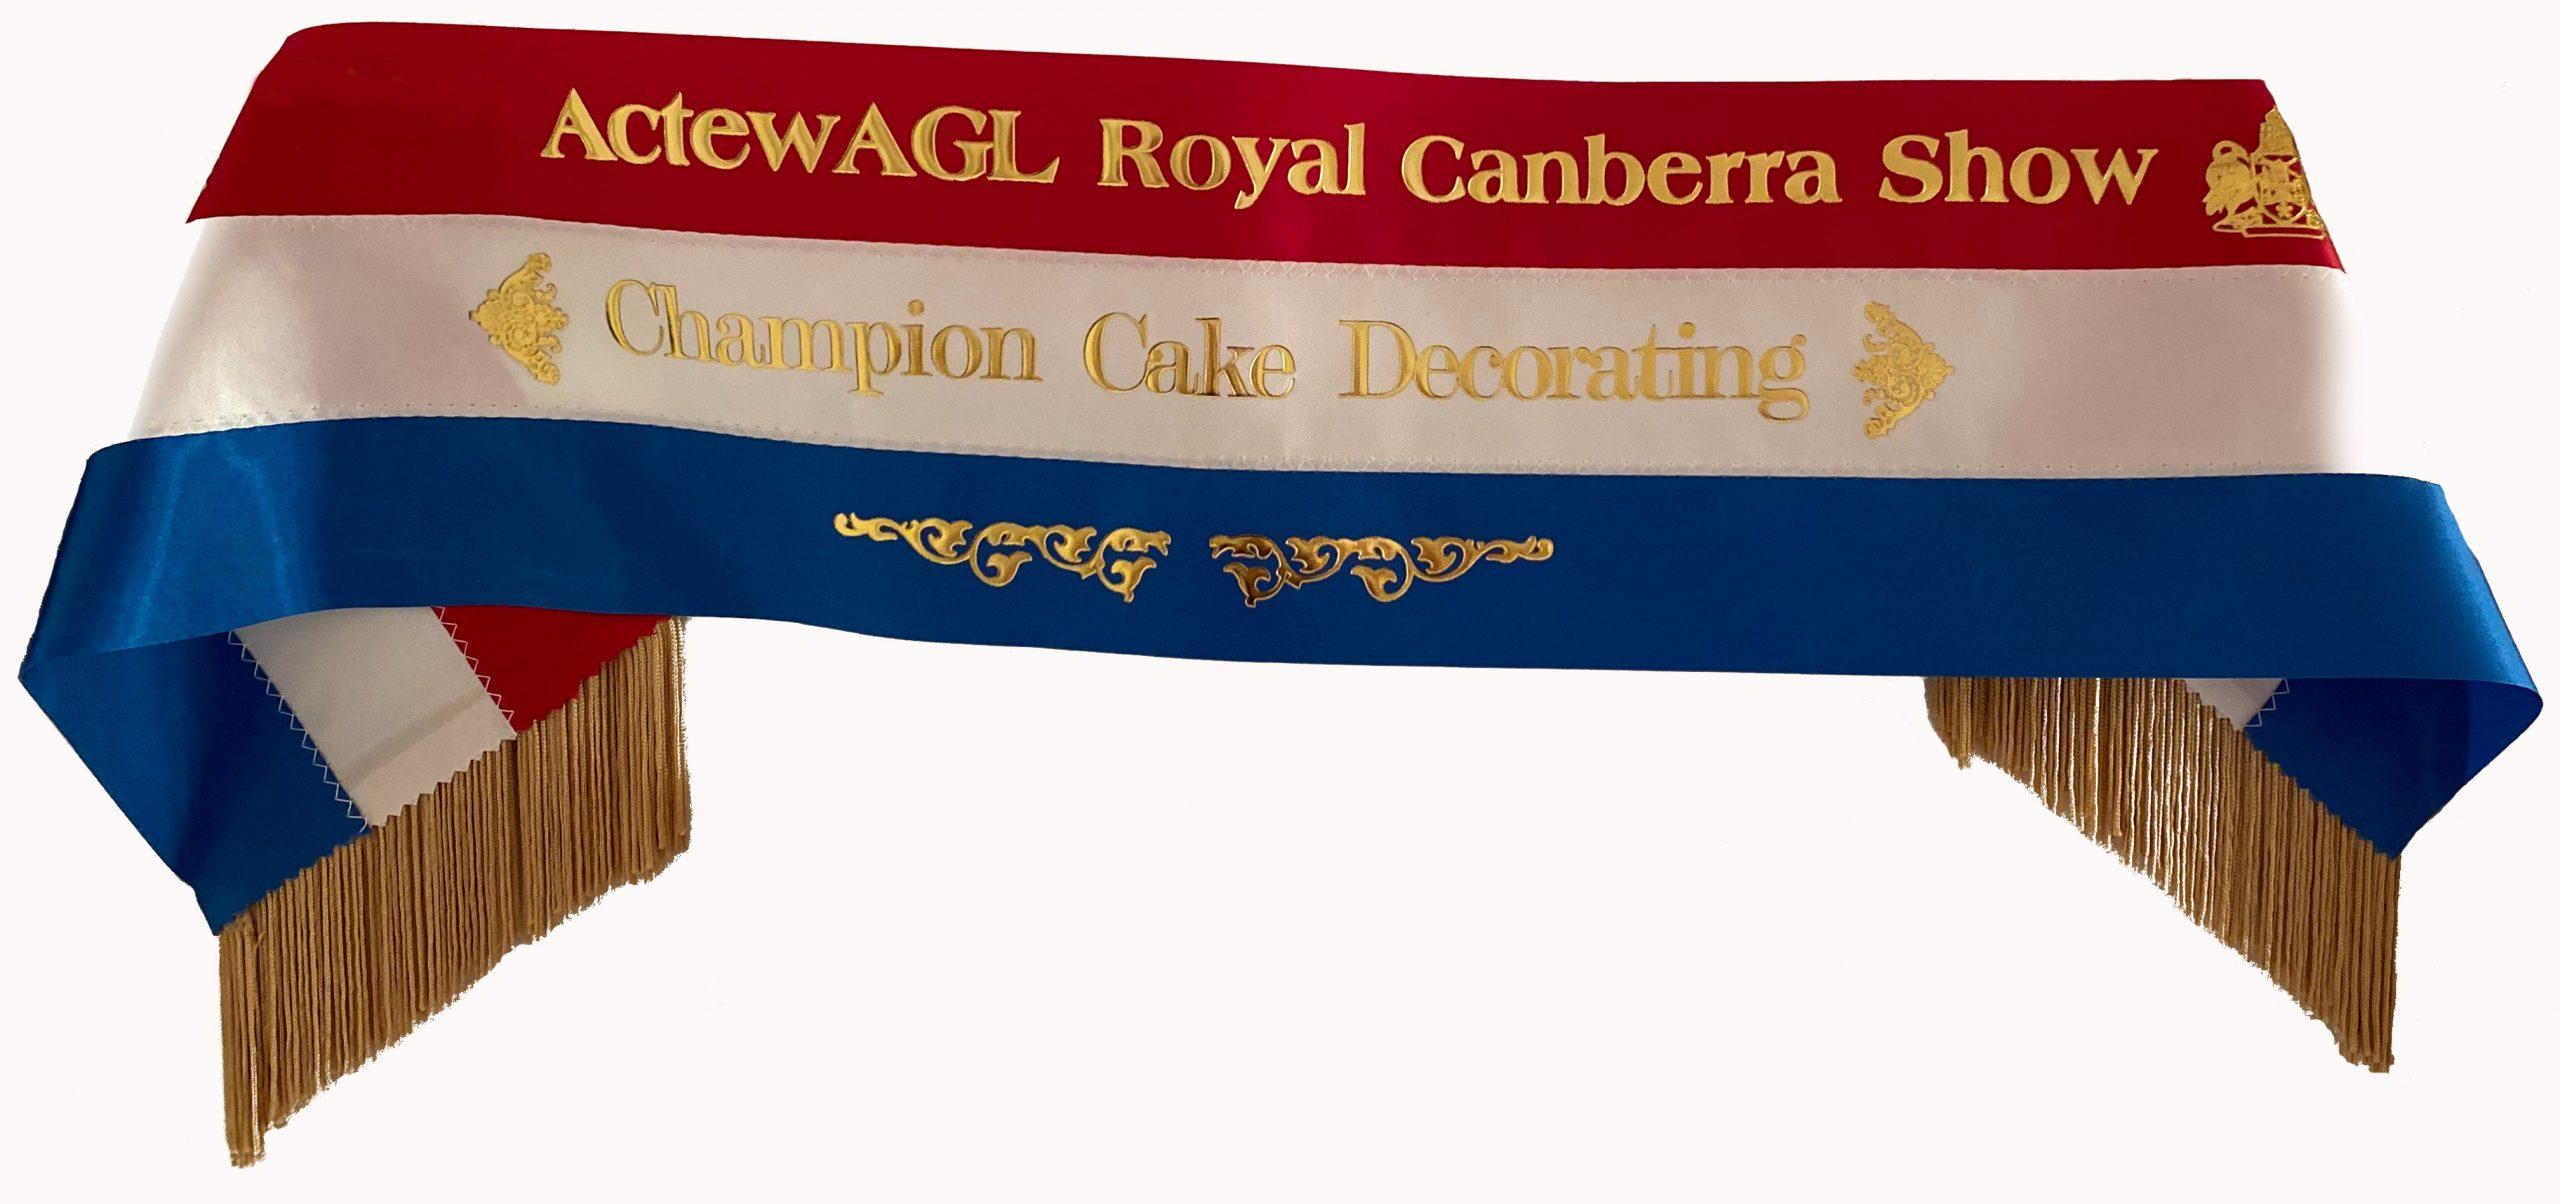 Cake Decorating Champion